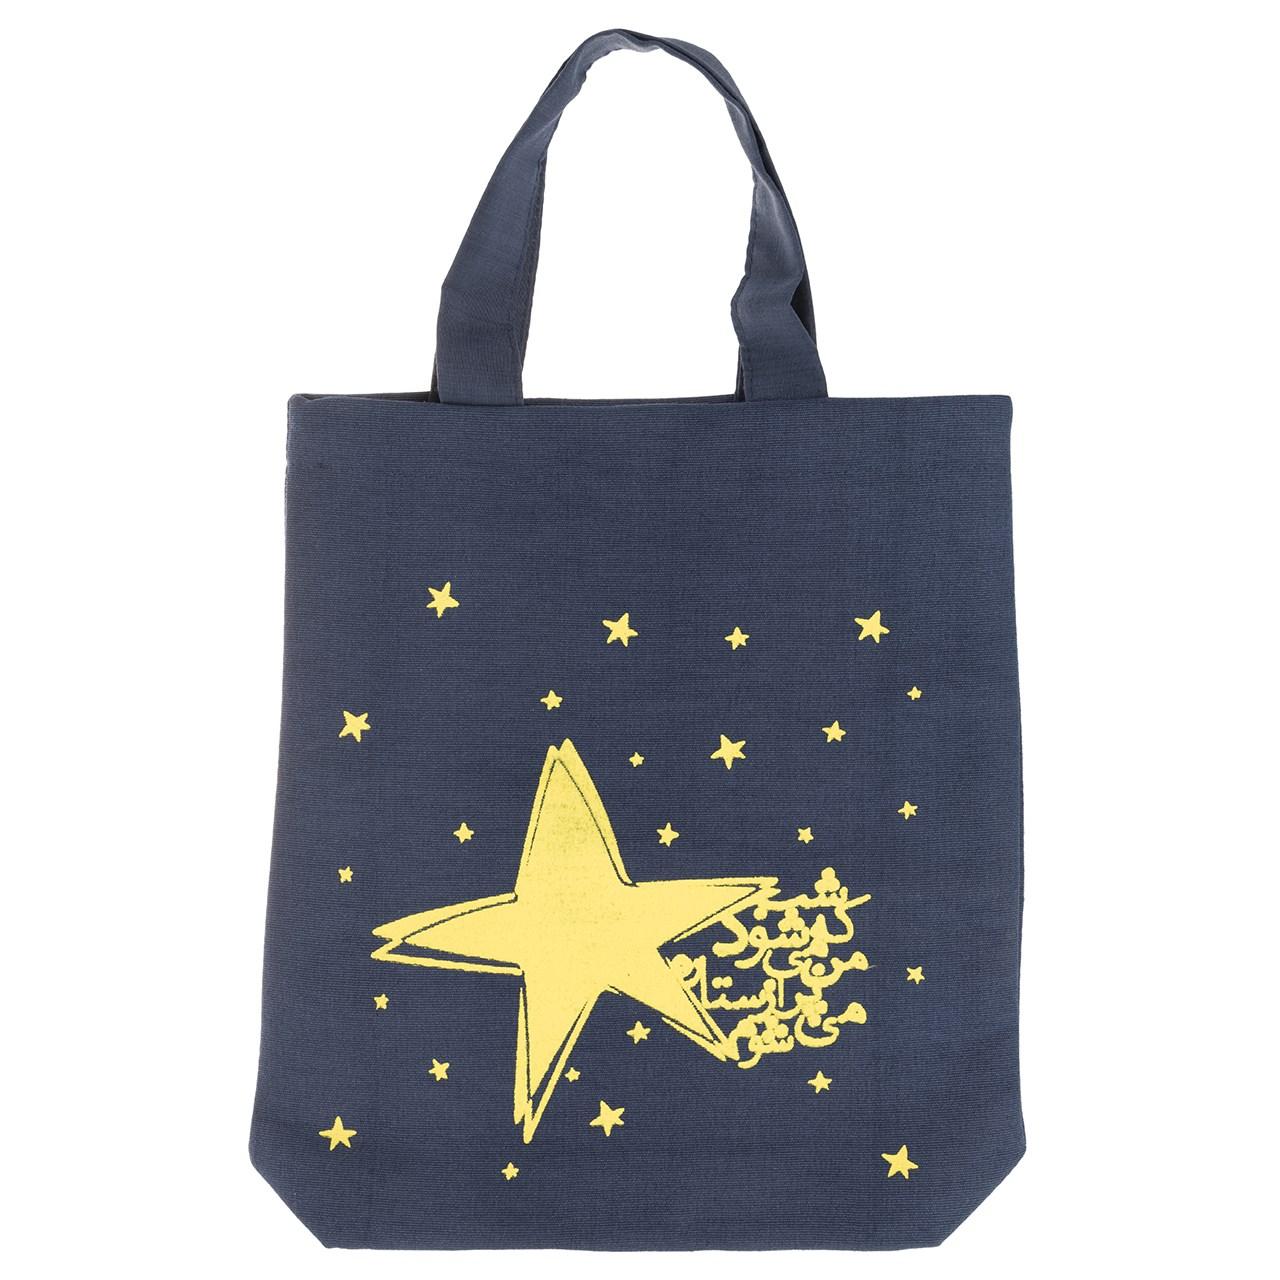 ساک خرید گوشه طرح ستاره